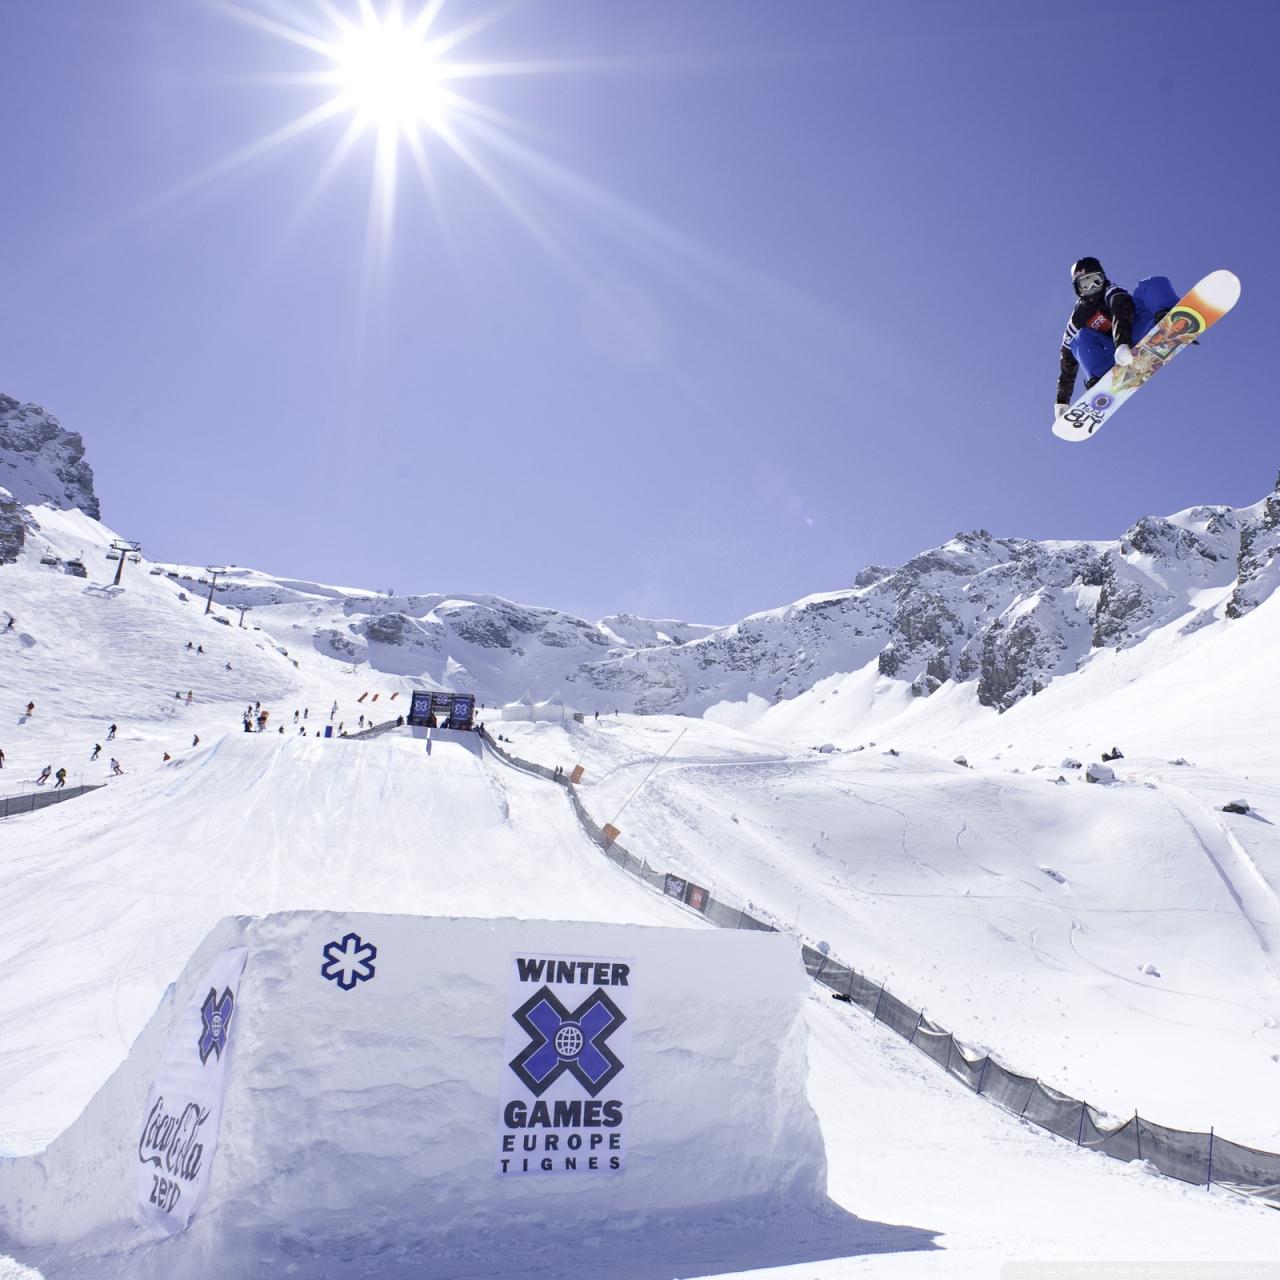 Winter Games Europe Tignes 4K HD Desktop Wallpaper for 4K Ultra 1280x1280